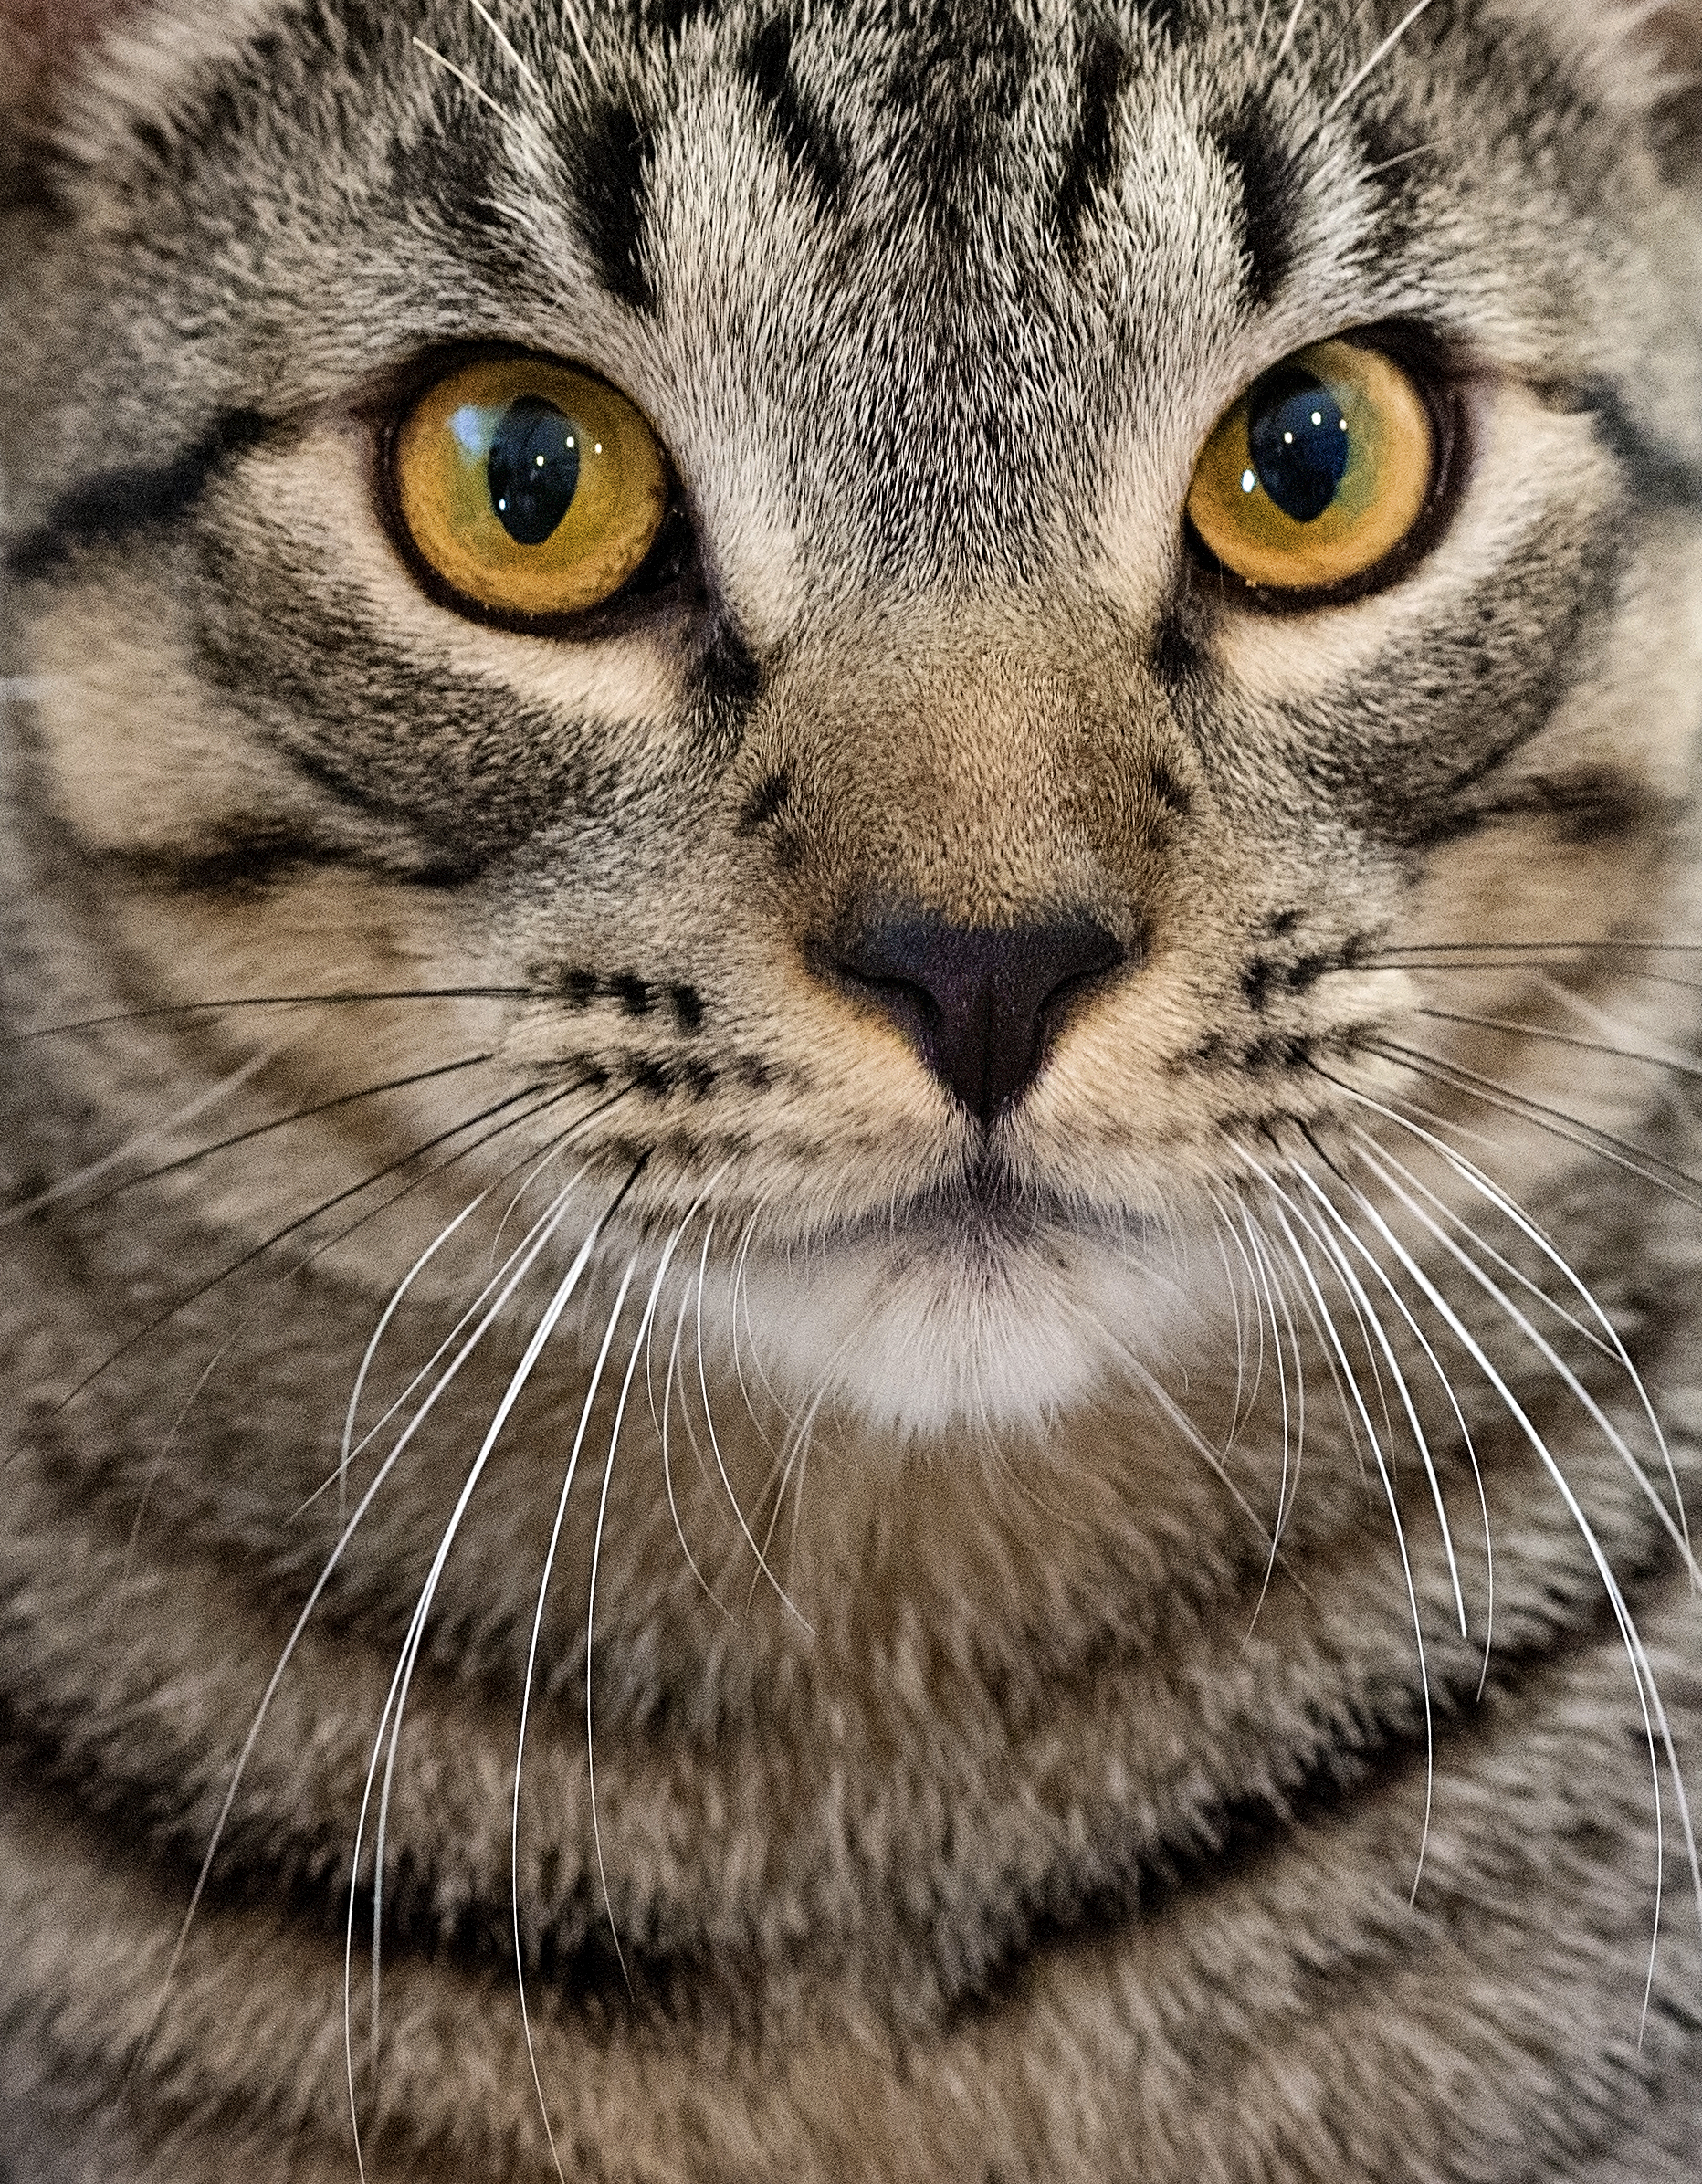 Mcdade Cat.jpg